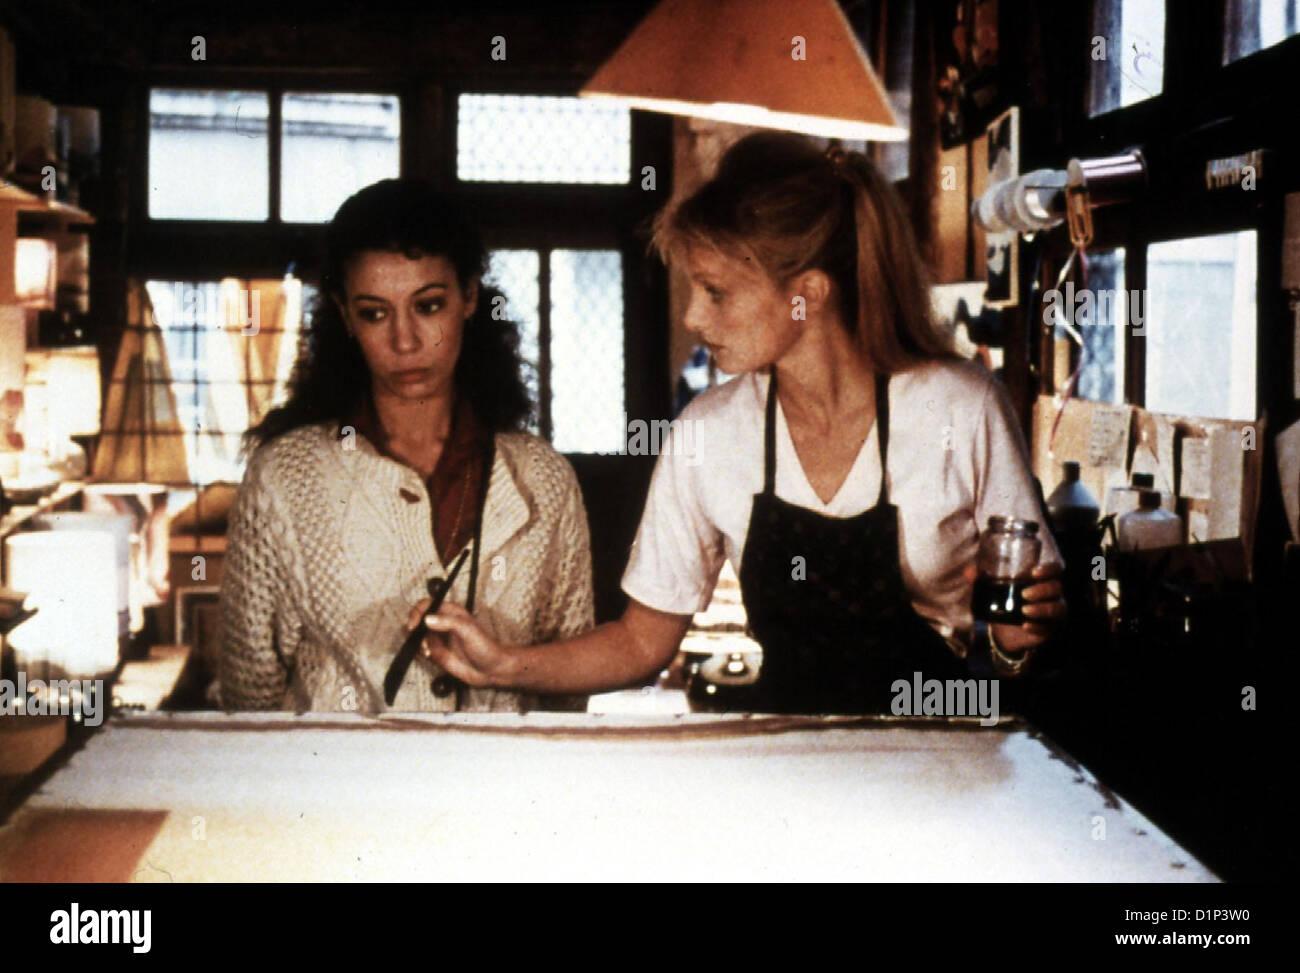 Die Schoene Hochzeit   Beau Mariage, Le   Sabine (Beatrice Romand), Clarisse (Arielle Dombasle) *** Local Caption - Stock Image